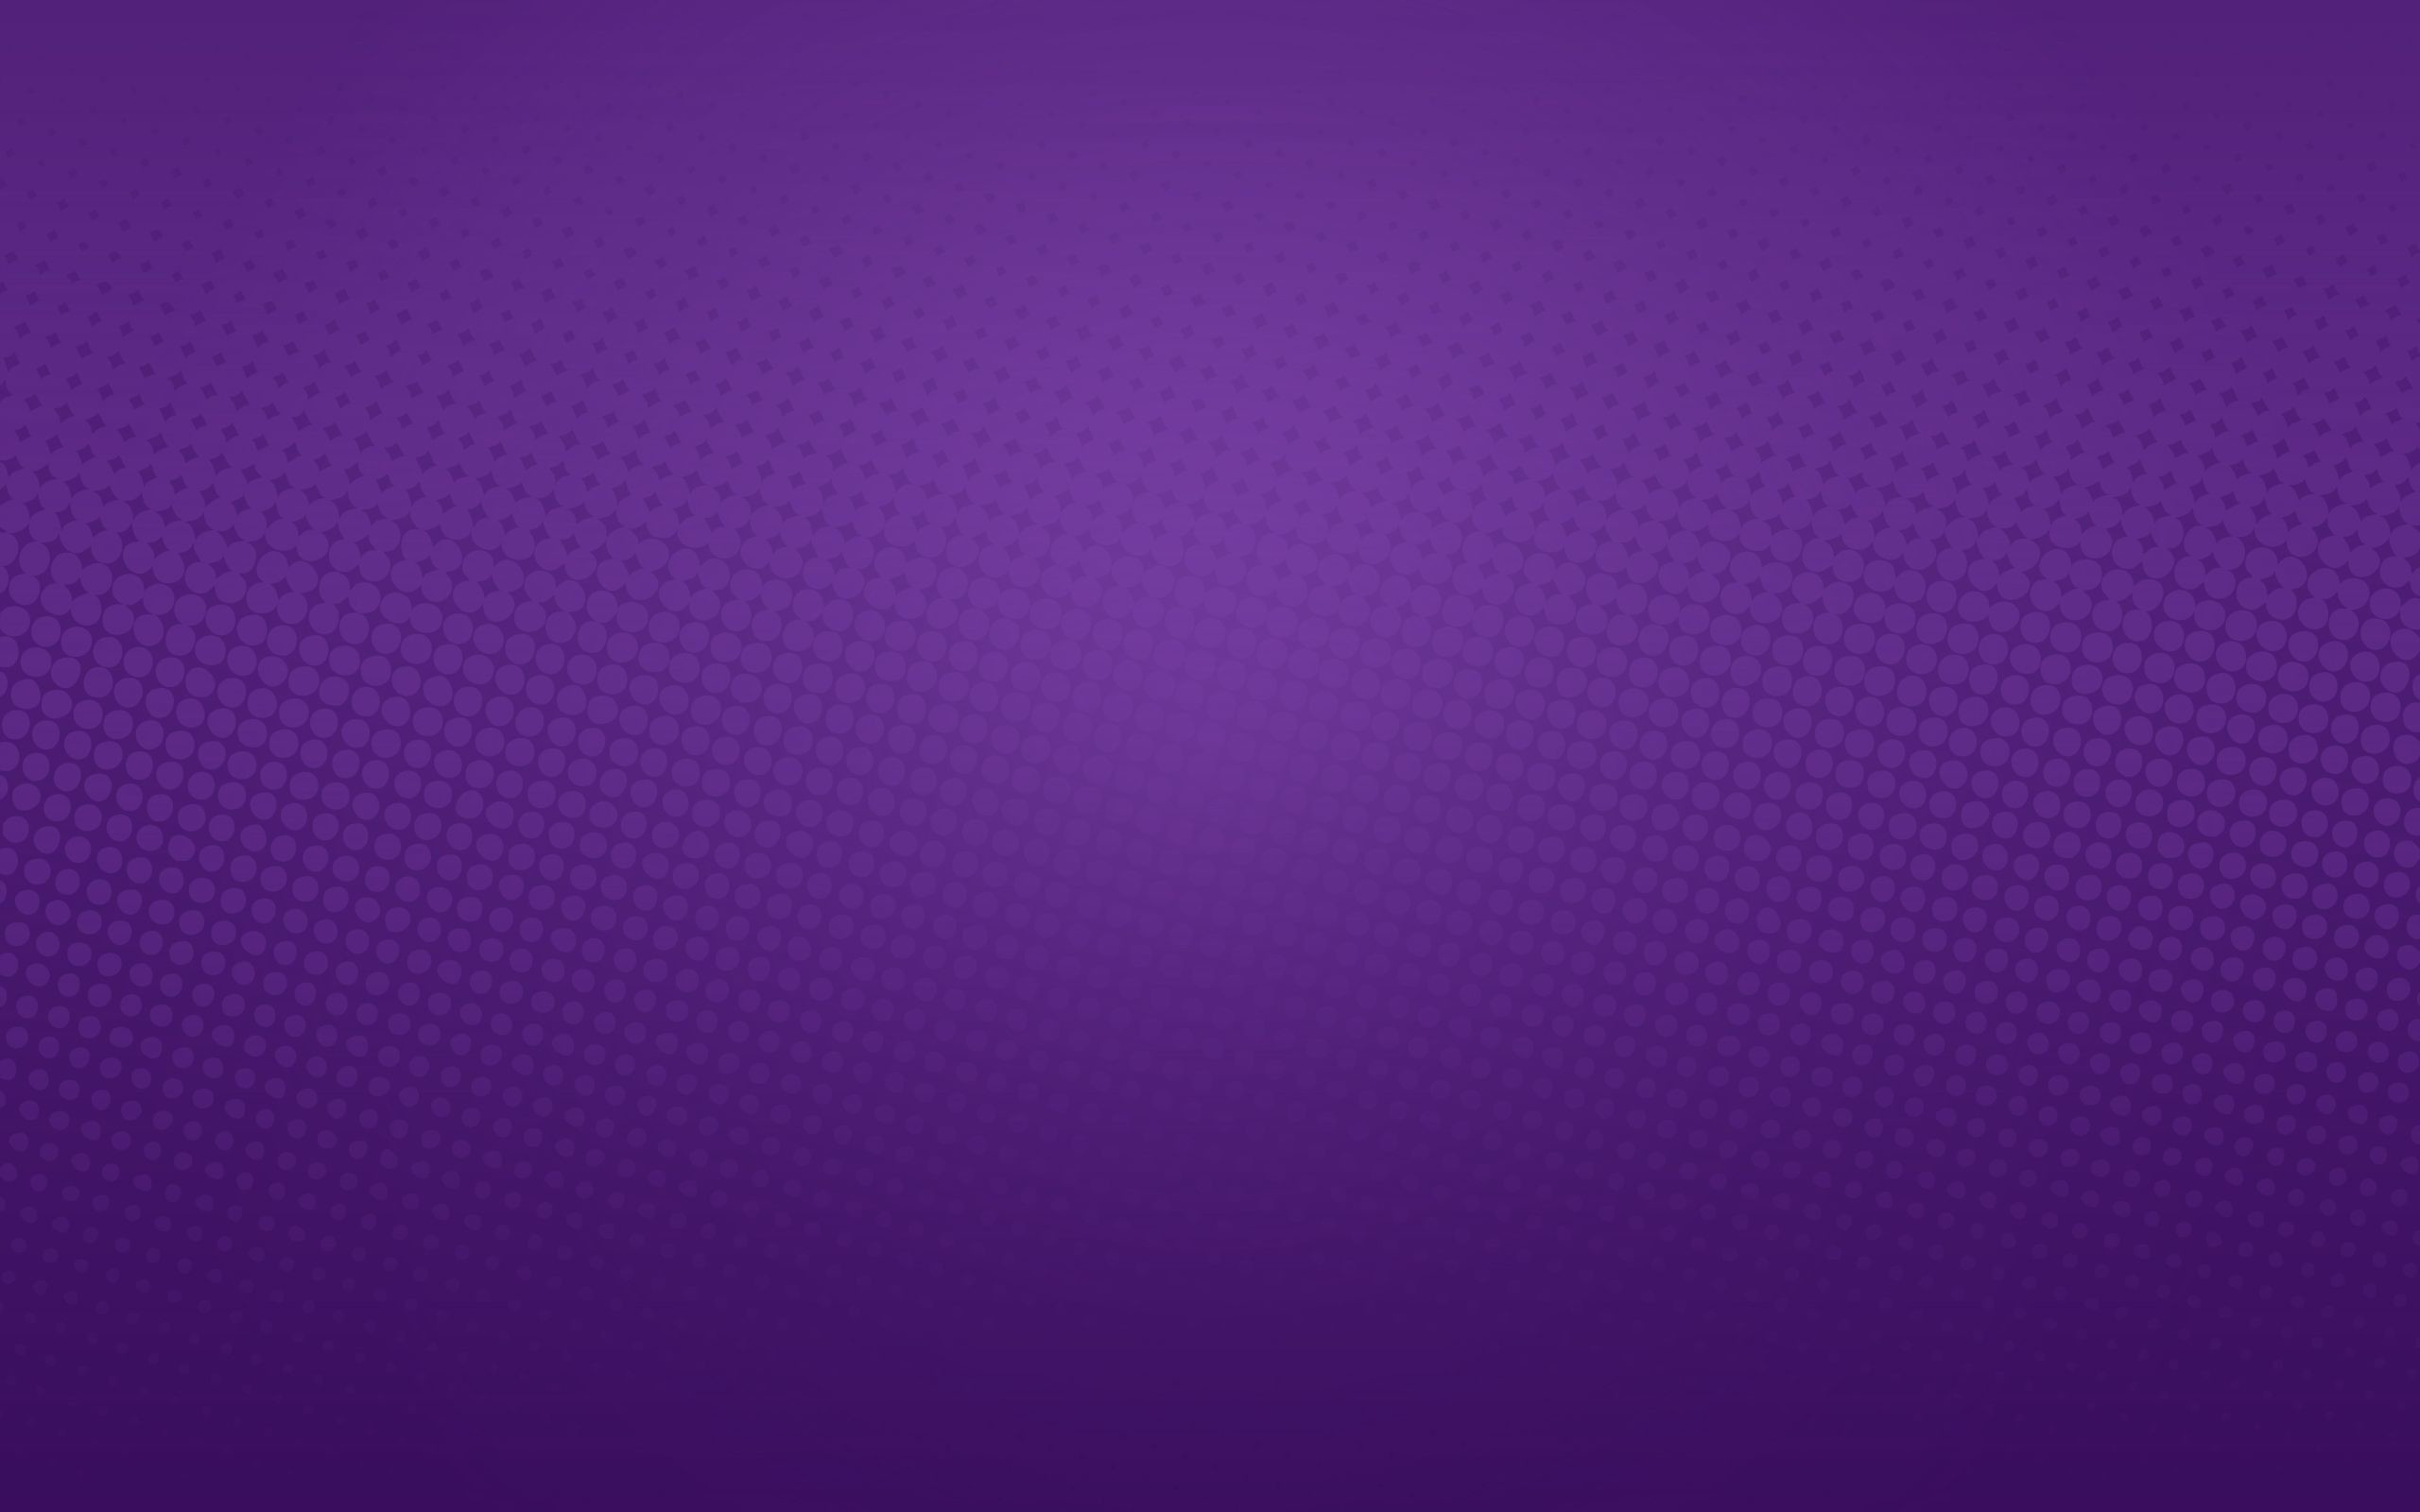 Awesome Purple Wallpaper Themes #2859 Wallpaper